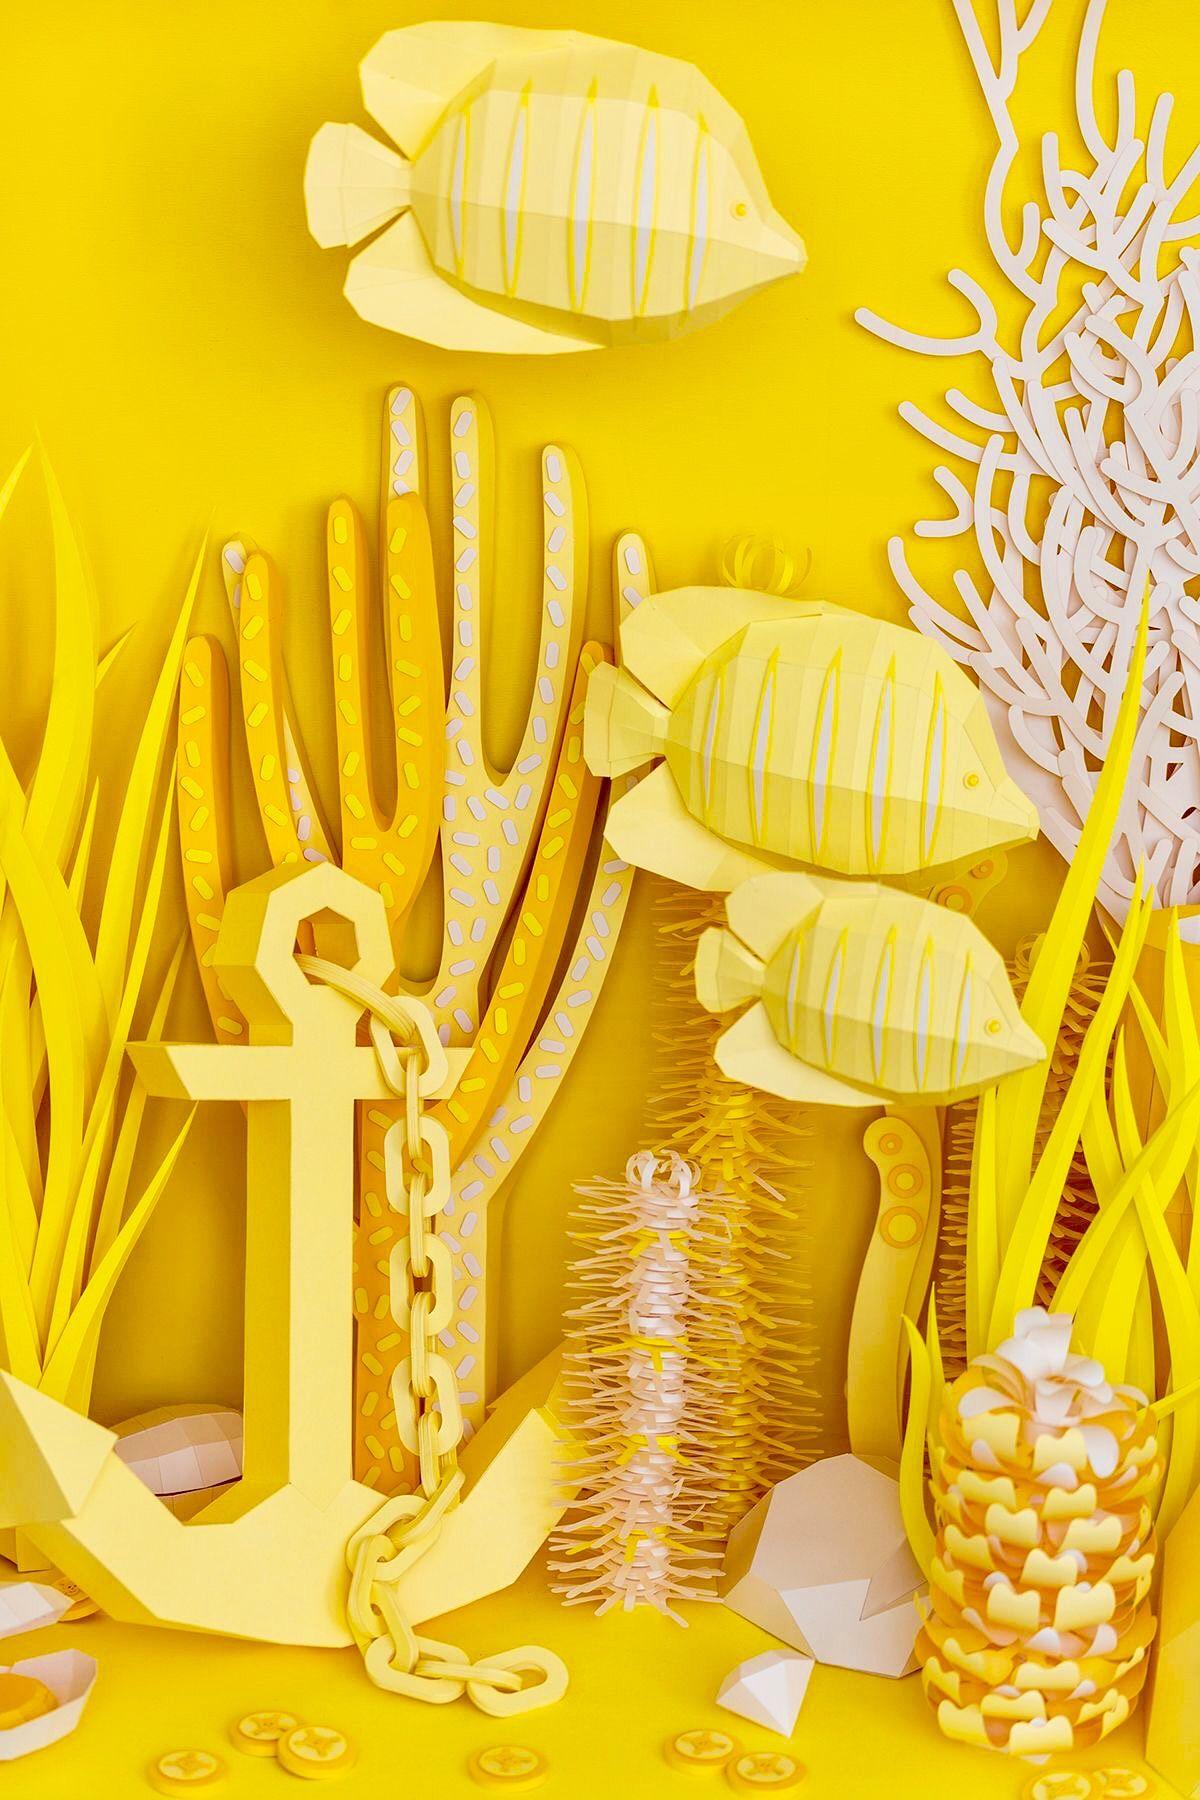 Pastel Aesthetic Intro Background